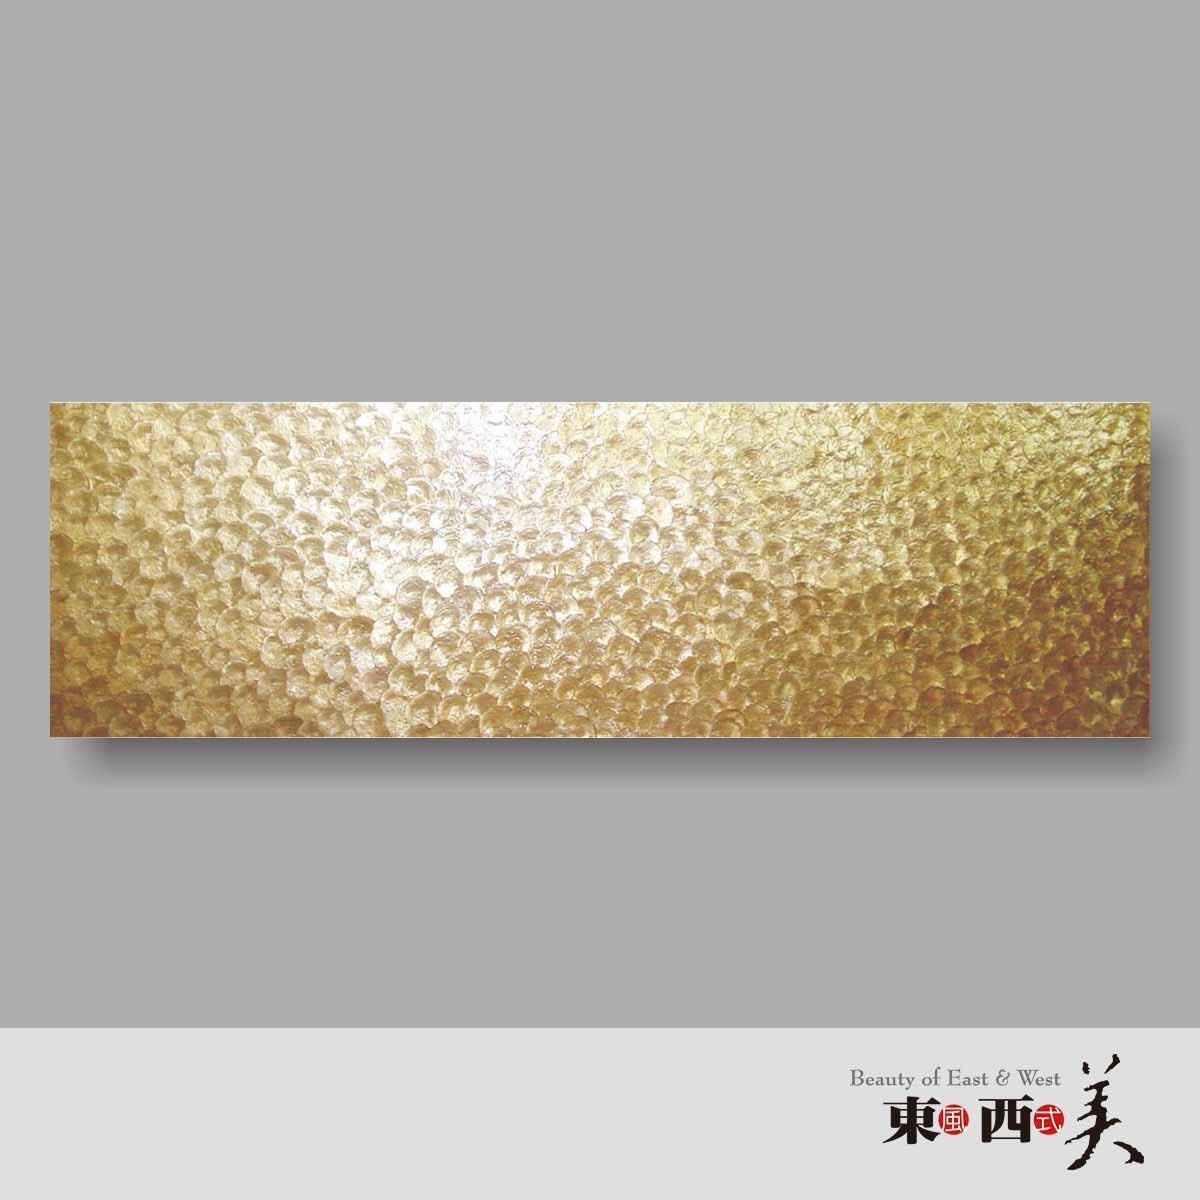 Capiz Seashells Mother Of Pearl Wall Art   Capiz Shell Wall Decor For Capiz Shell Wall Art (Image 7 of 20)